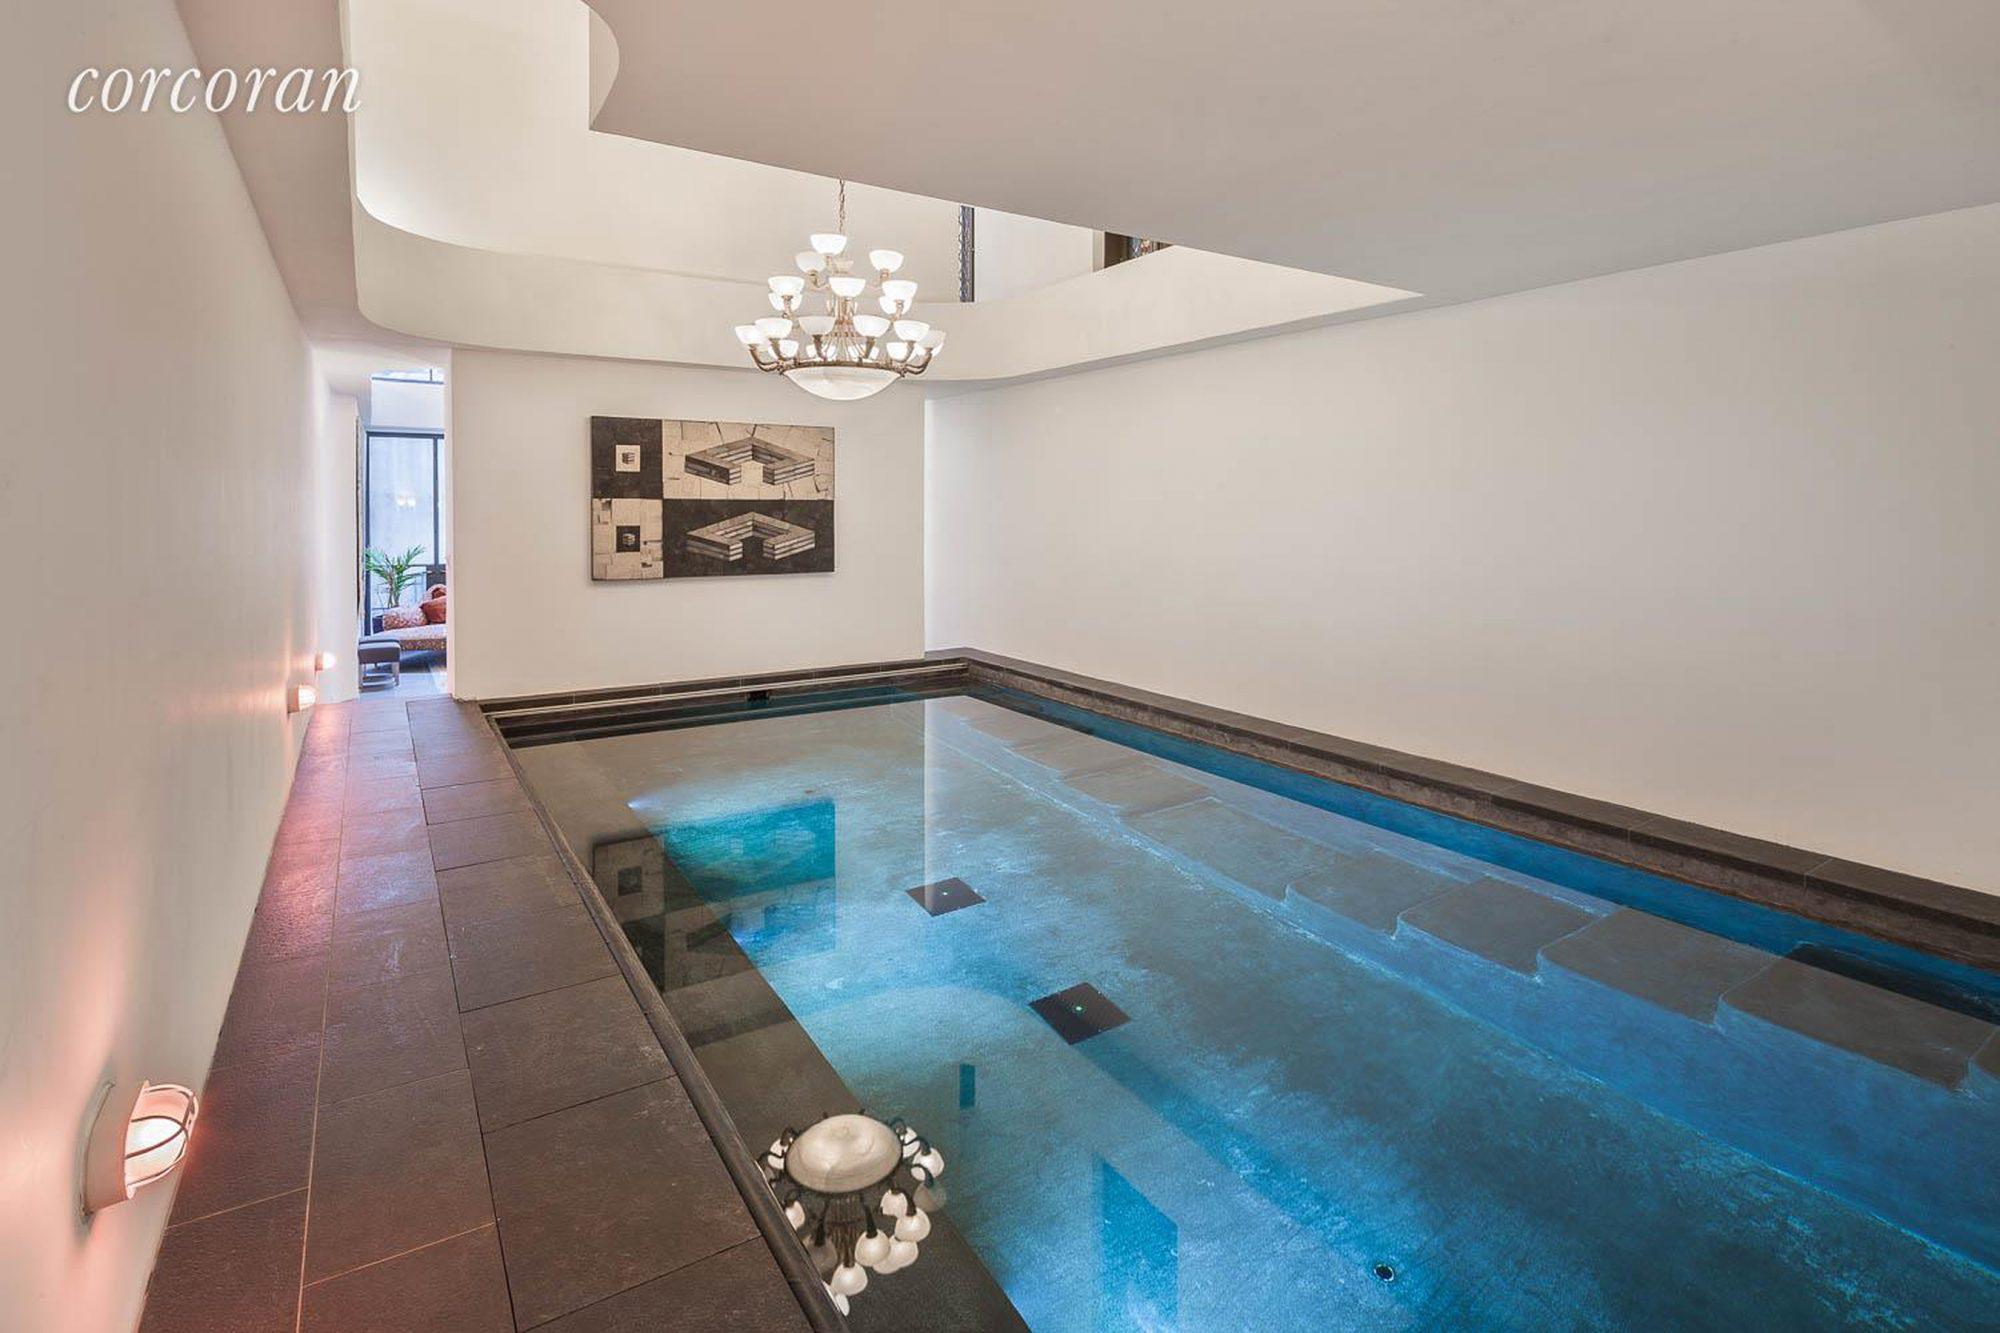 Taylor Swift S Cornelia Street Apartment Has A Pool Ew Com